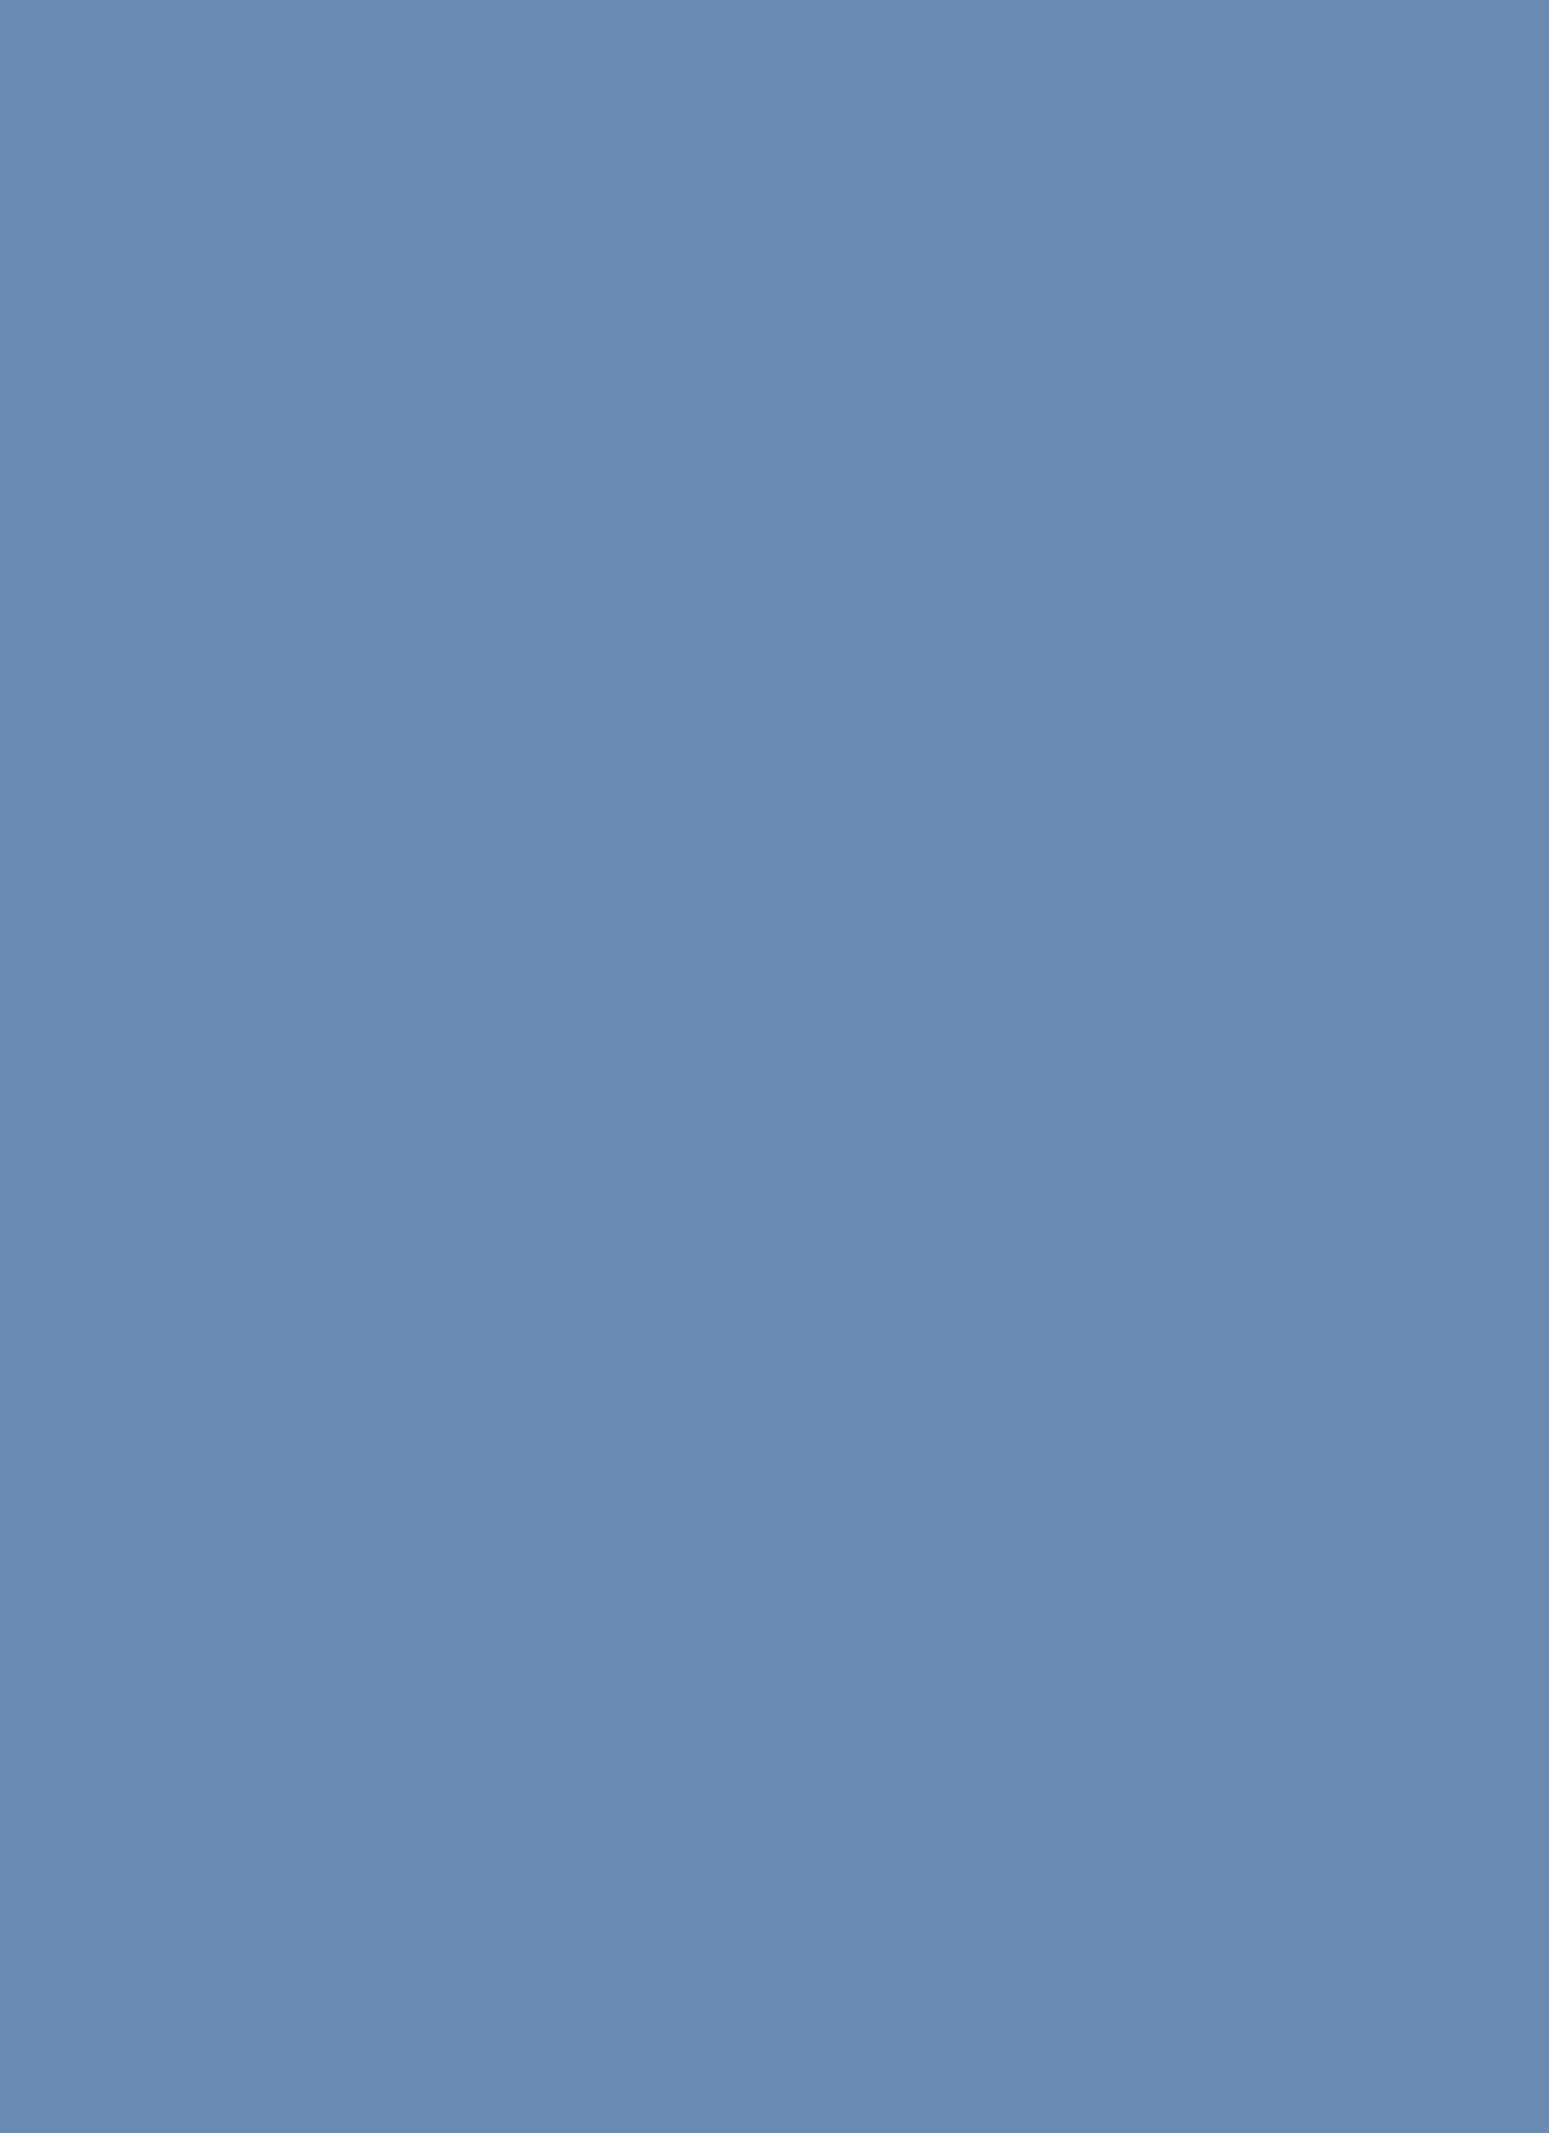 Dragon Print High Cut Bodysuit Top in Blue Size: Small